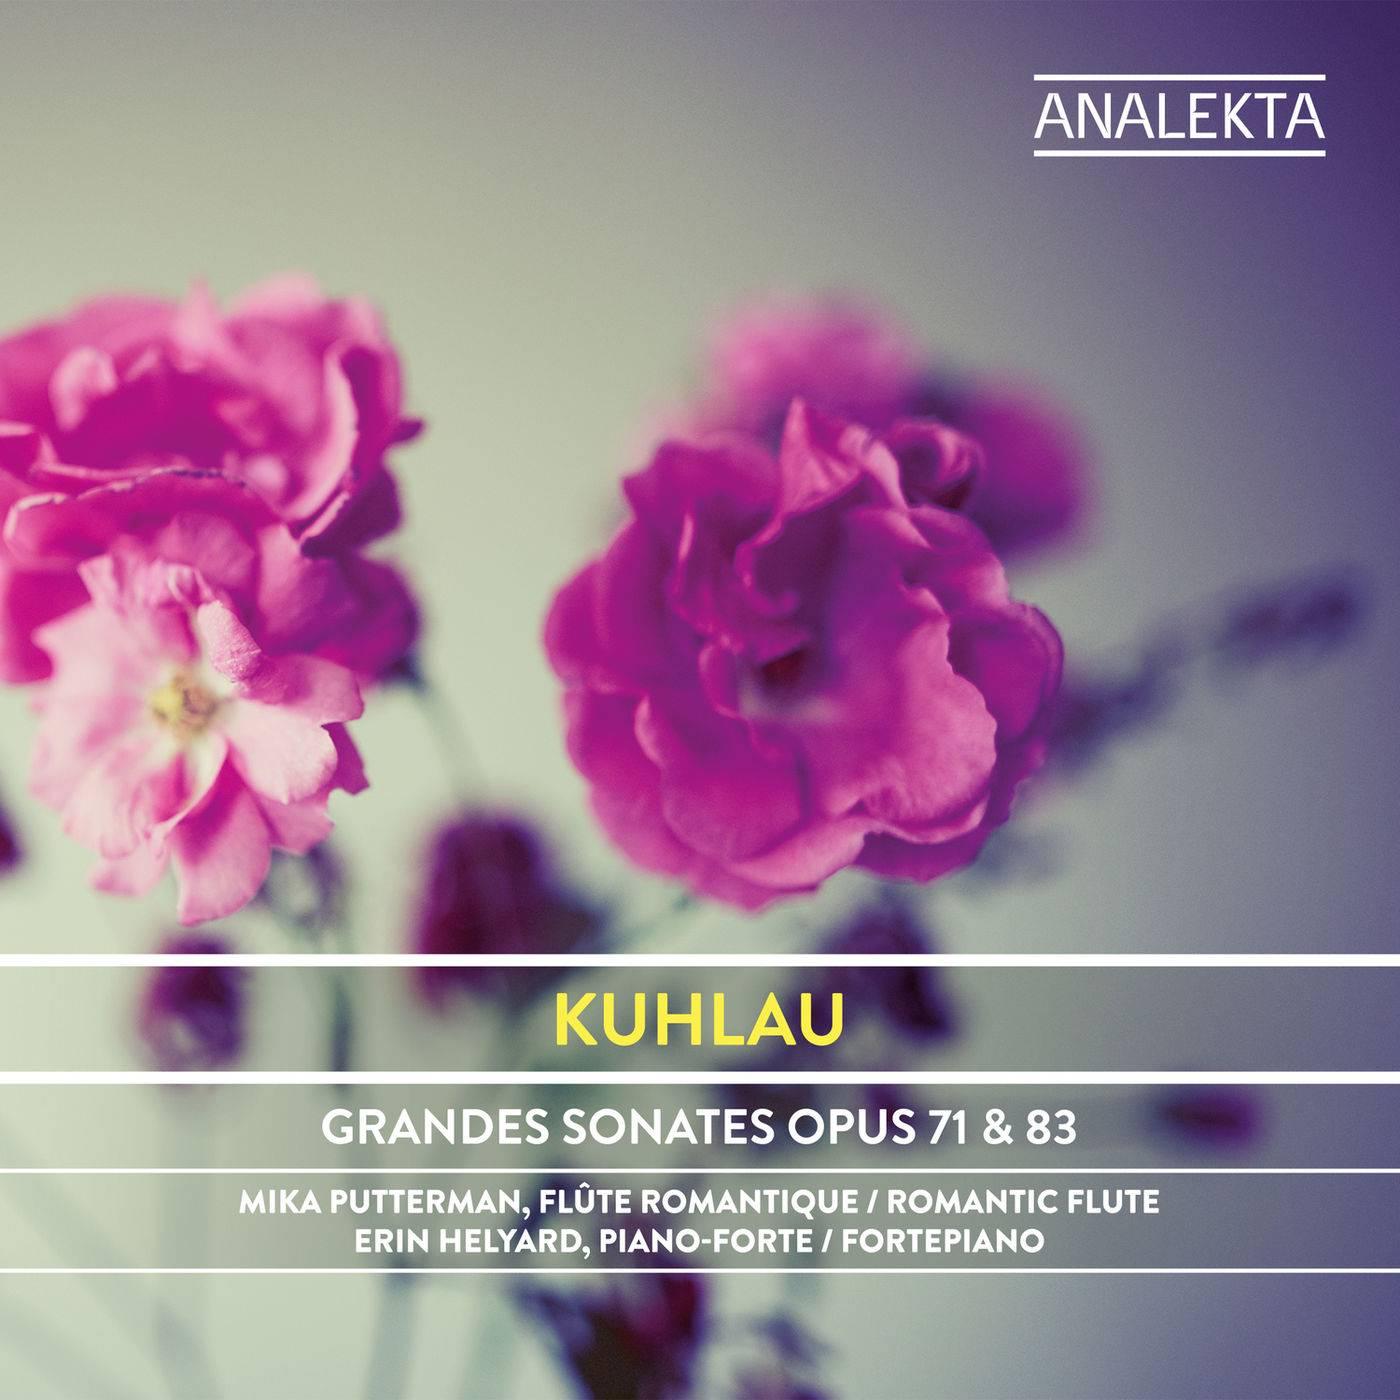 Mika Putterman & Erin Helyard - Kuhlau: Grandes Sonates, Op. 71 & 83 (2018) [Official Digital Download 24/96]